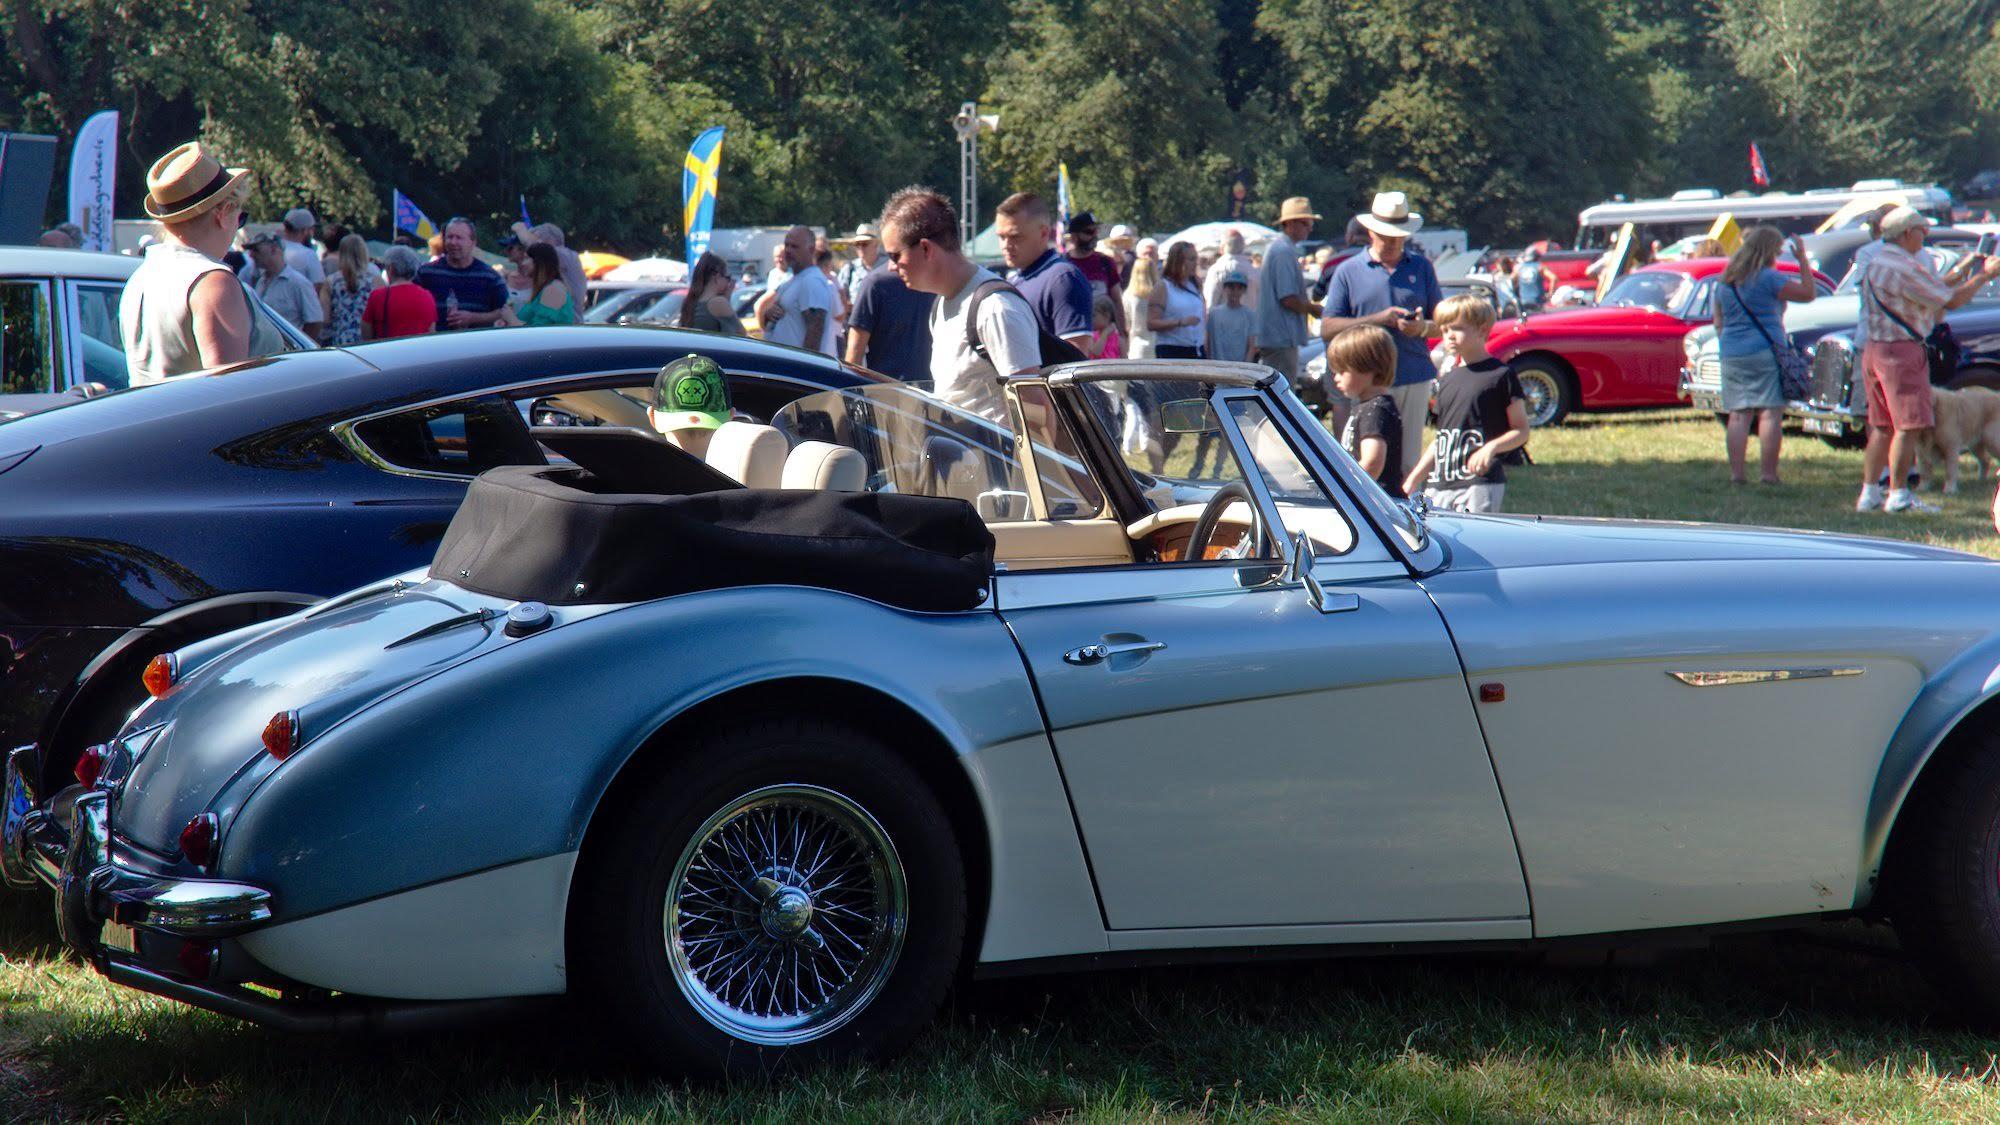 Mount Edgcumbe Classic Car Show 2020